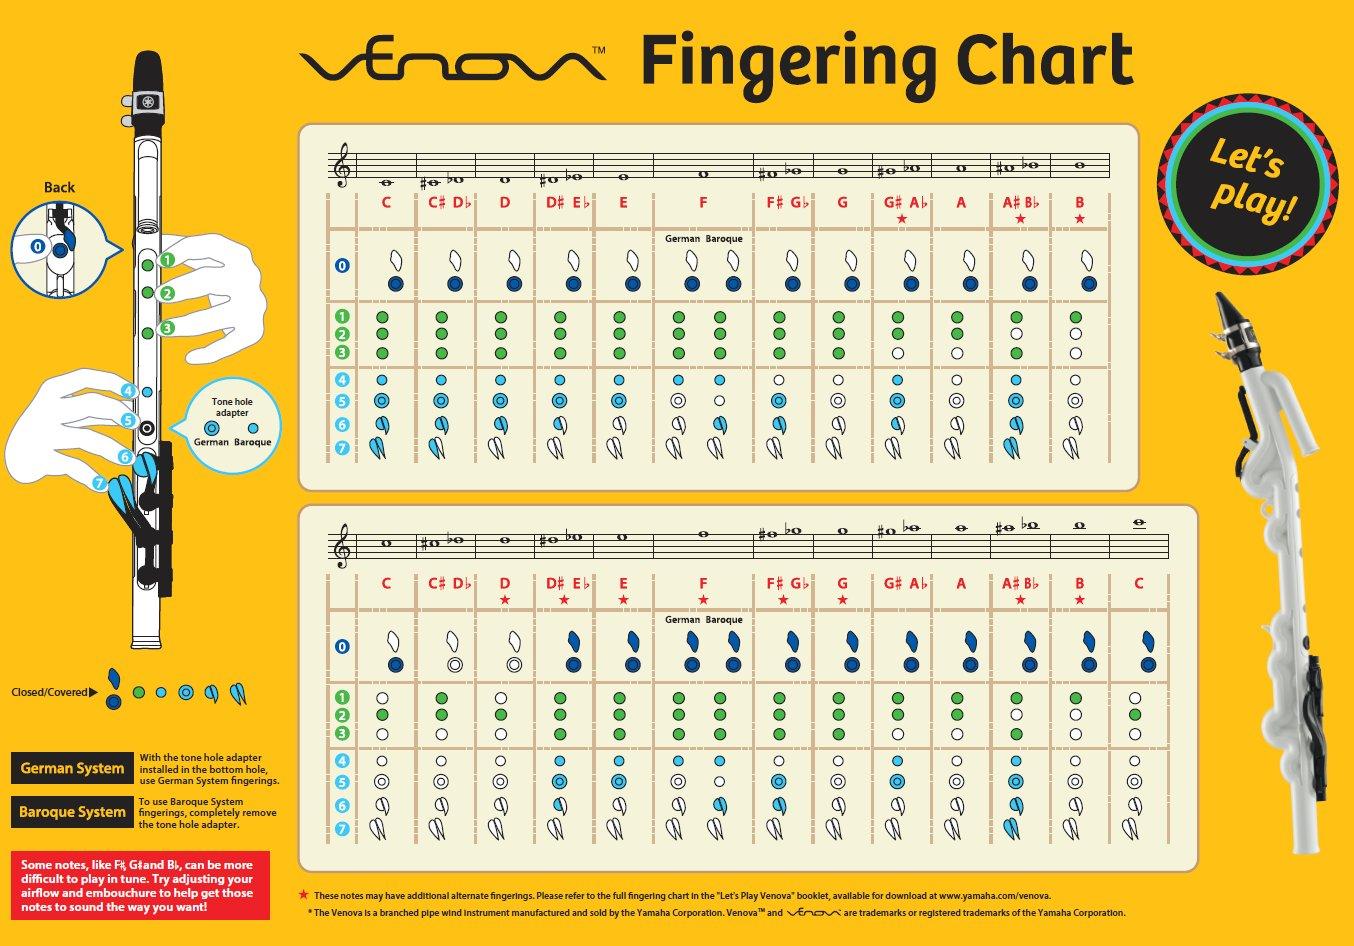 Yamaha Venova Fingering Chart